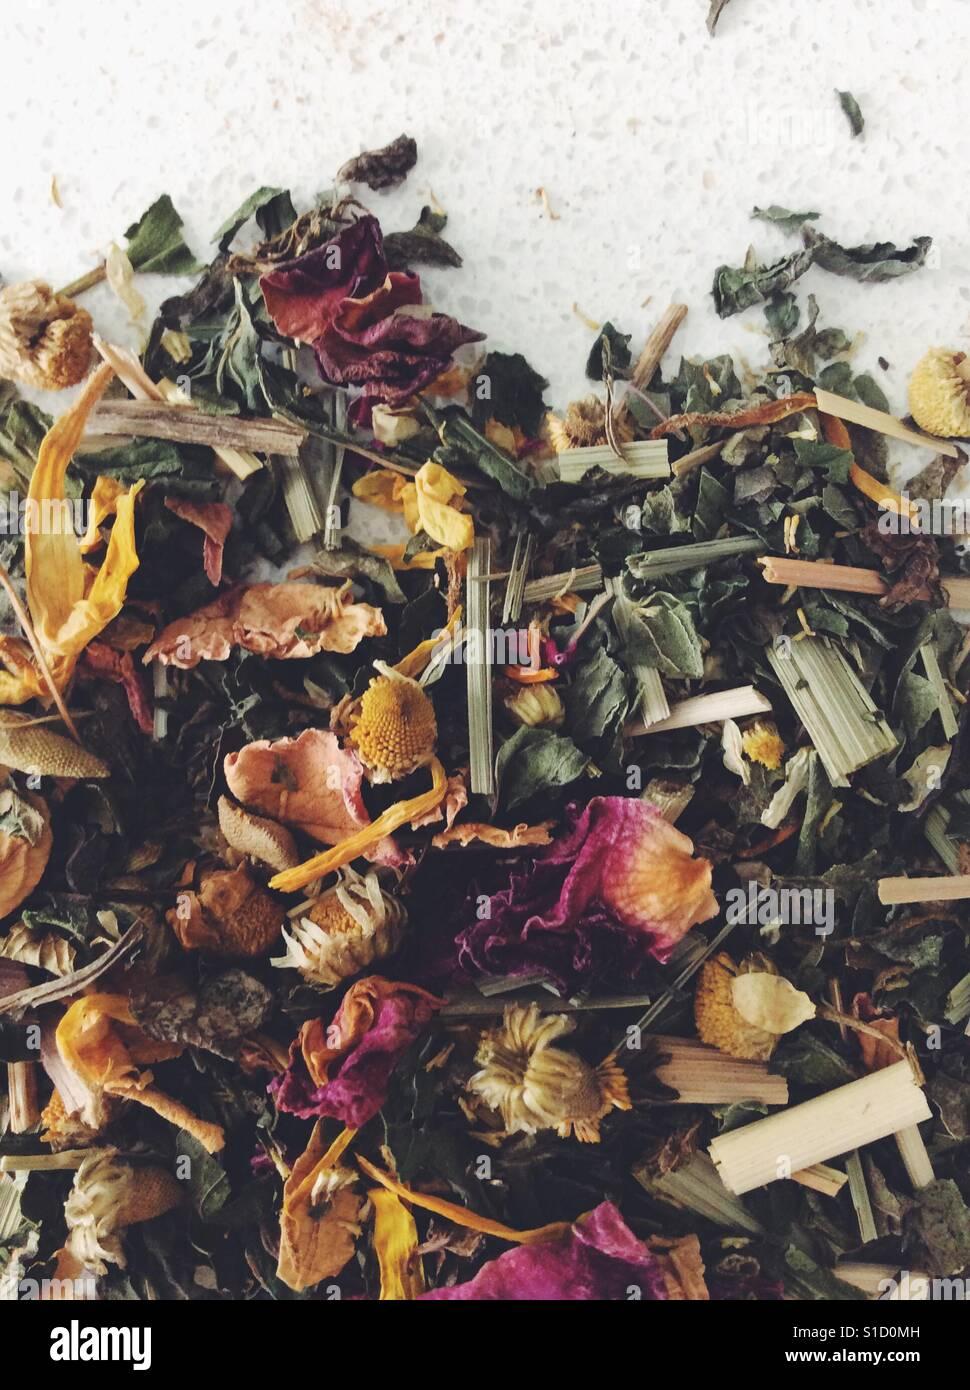 Floral detox tea - Stock Image